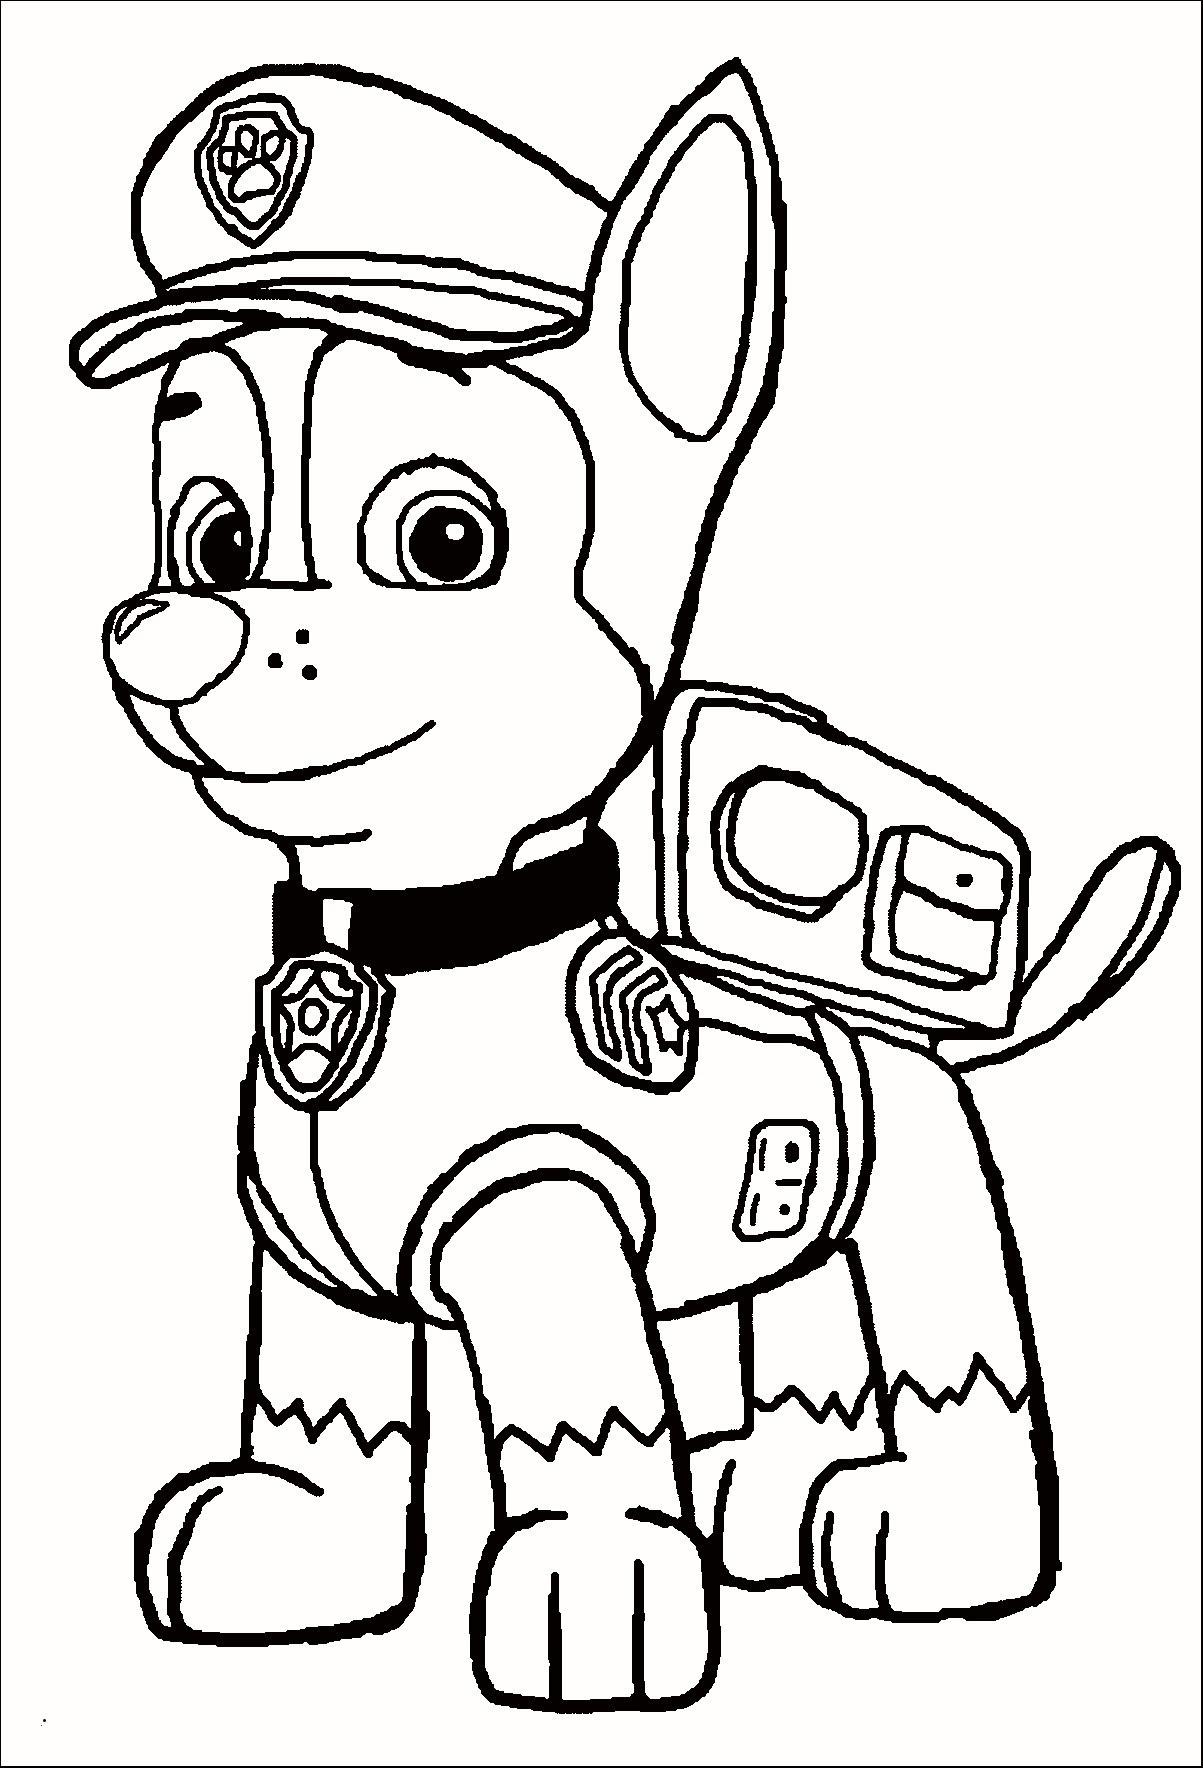 Paw Patrol Ausmalbild Frisch 36 Skizze Paw Patrol Ausmalbilder Chase Treehouse Nyc Galerie